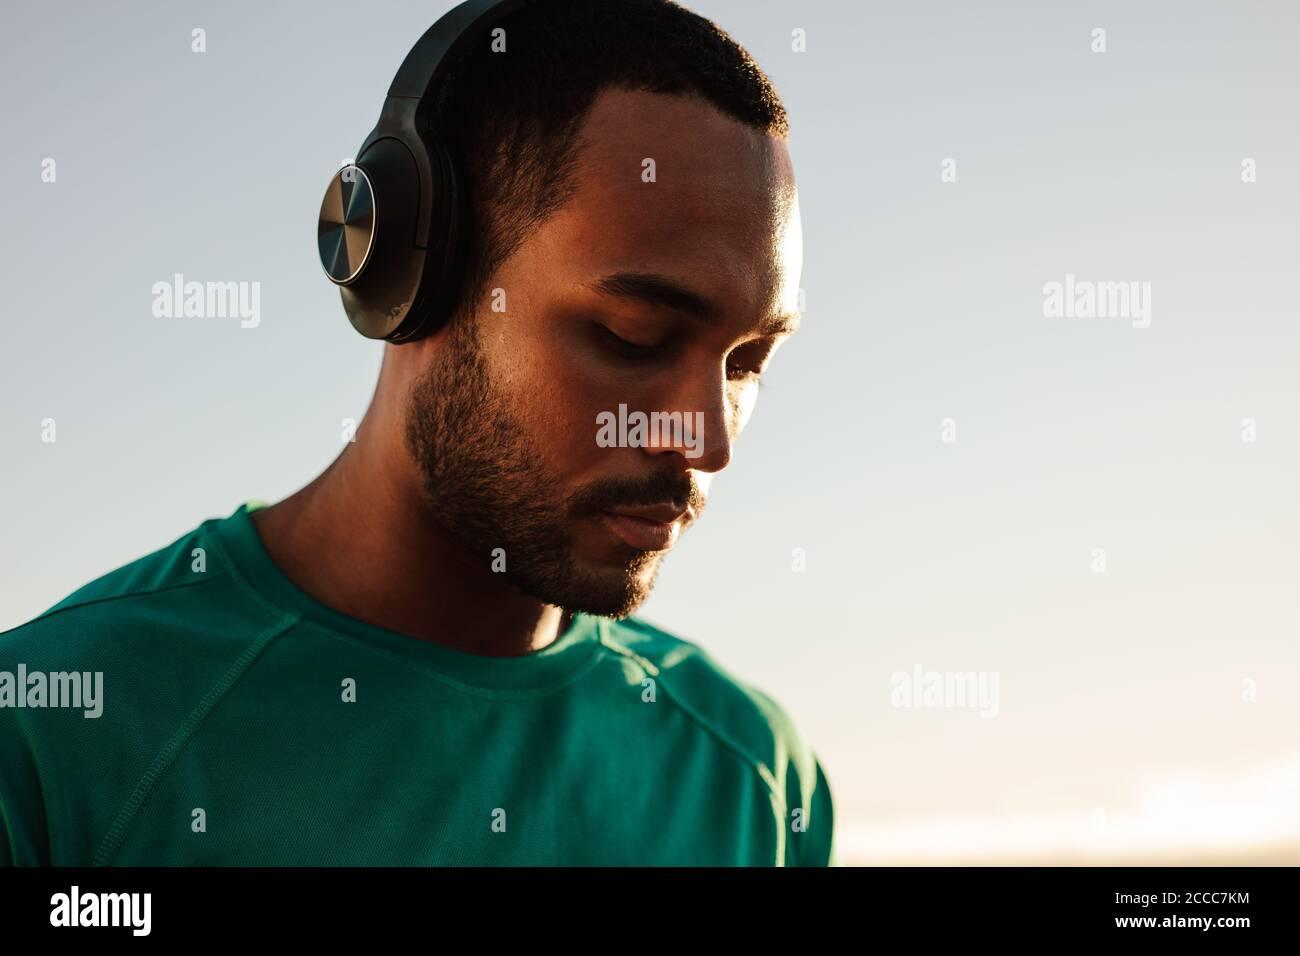 Retrato de un atleta afroamericano con auriculares inalámbricos. Primer plano de un hombre de fitness de pie al aire libre escuchando música. Foto de stock